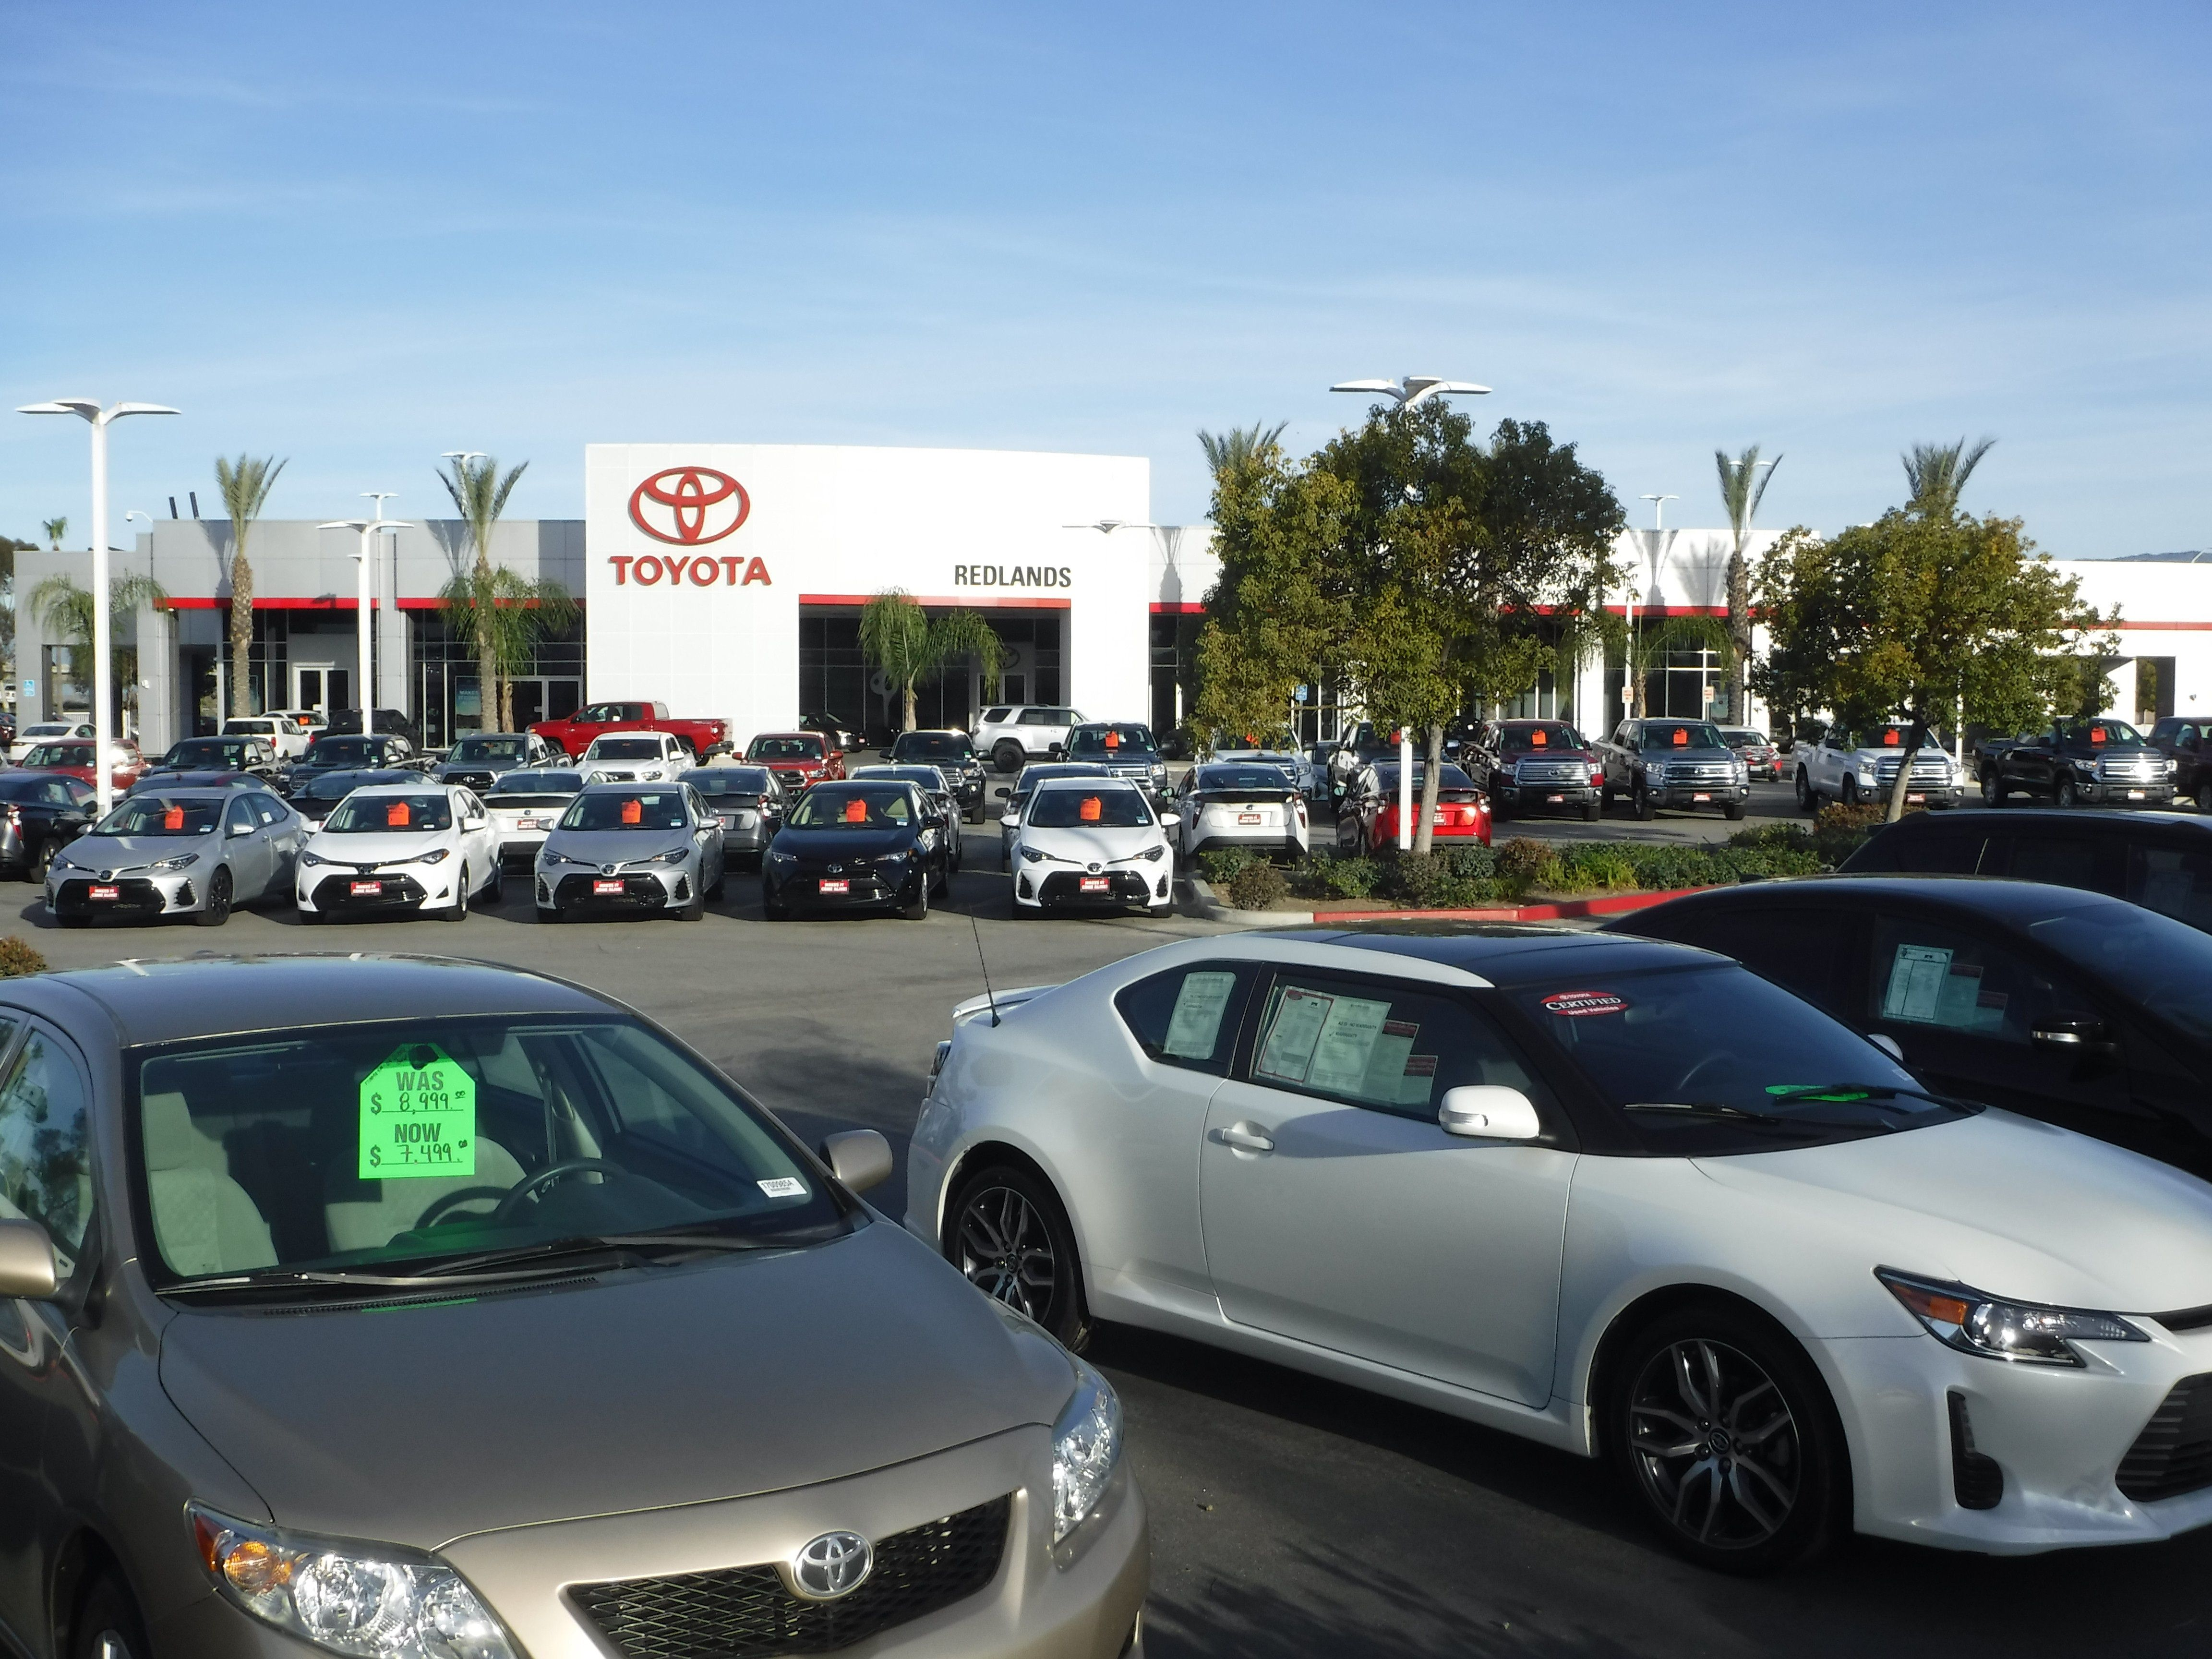 Preownedvehicles Newvehicles Toyotavehicles Toyotaservice Autorepairservice Autorepair Oilc Toyota Dealership Redlands Ca Pinte